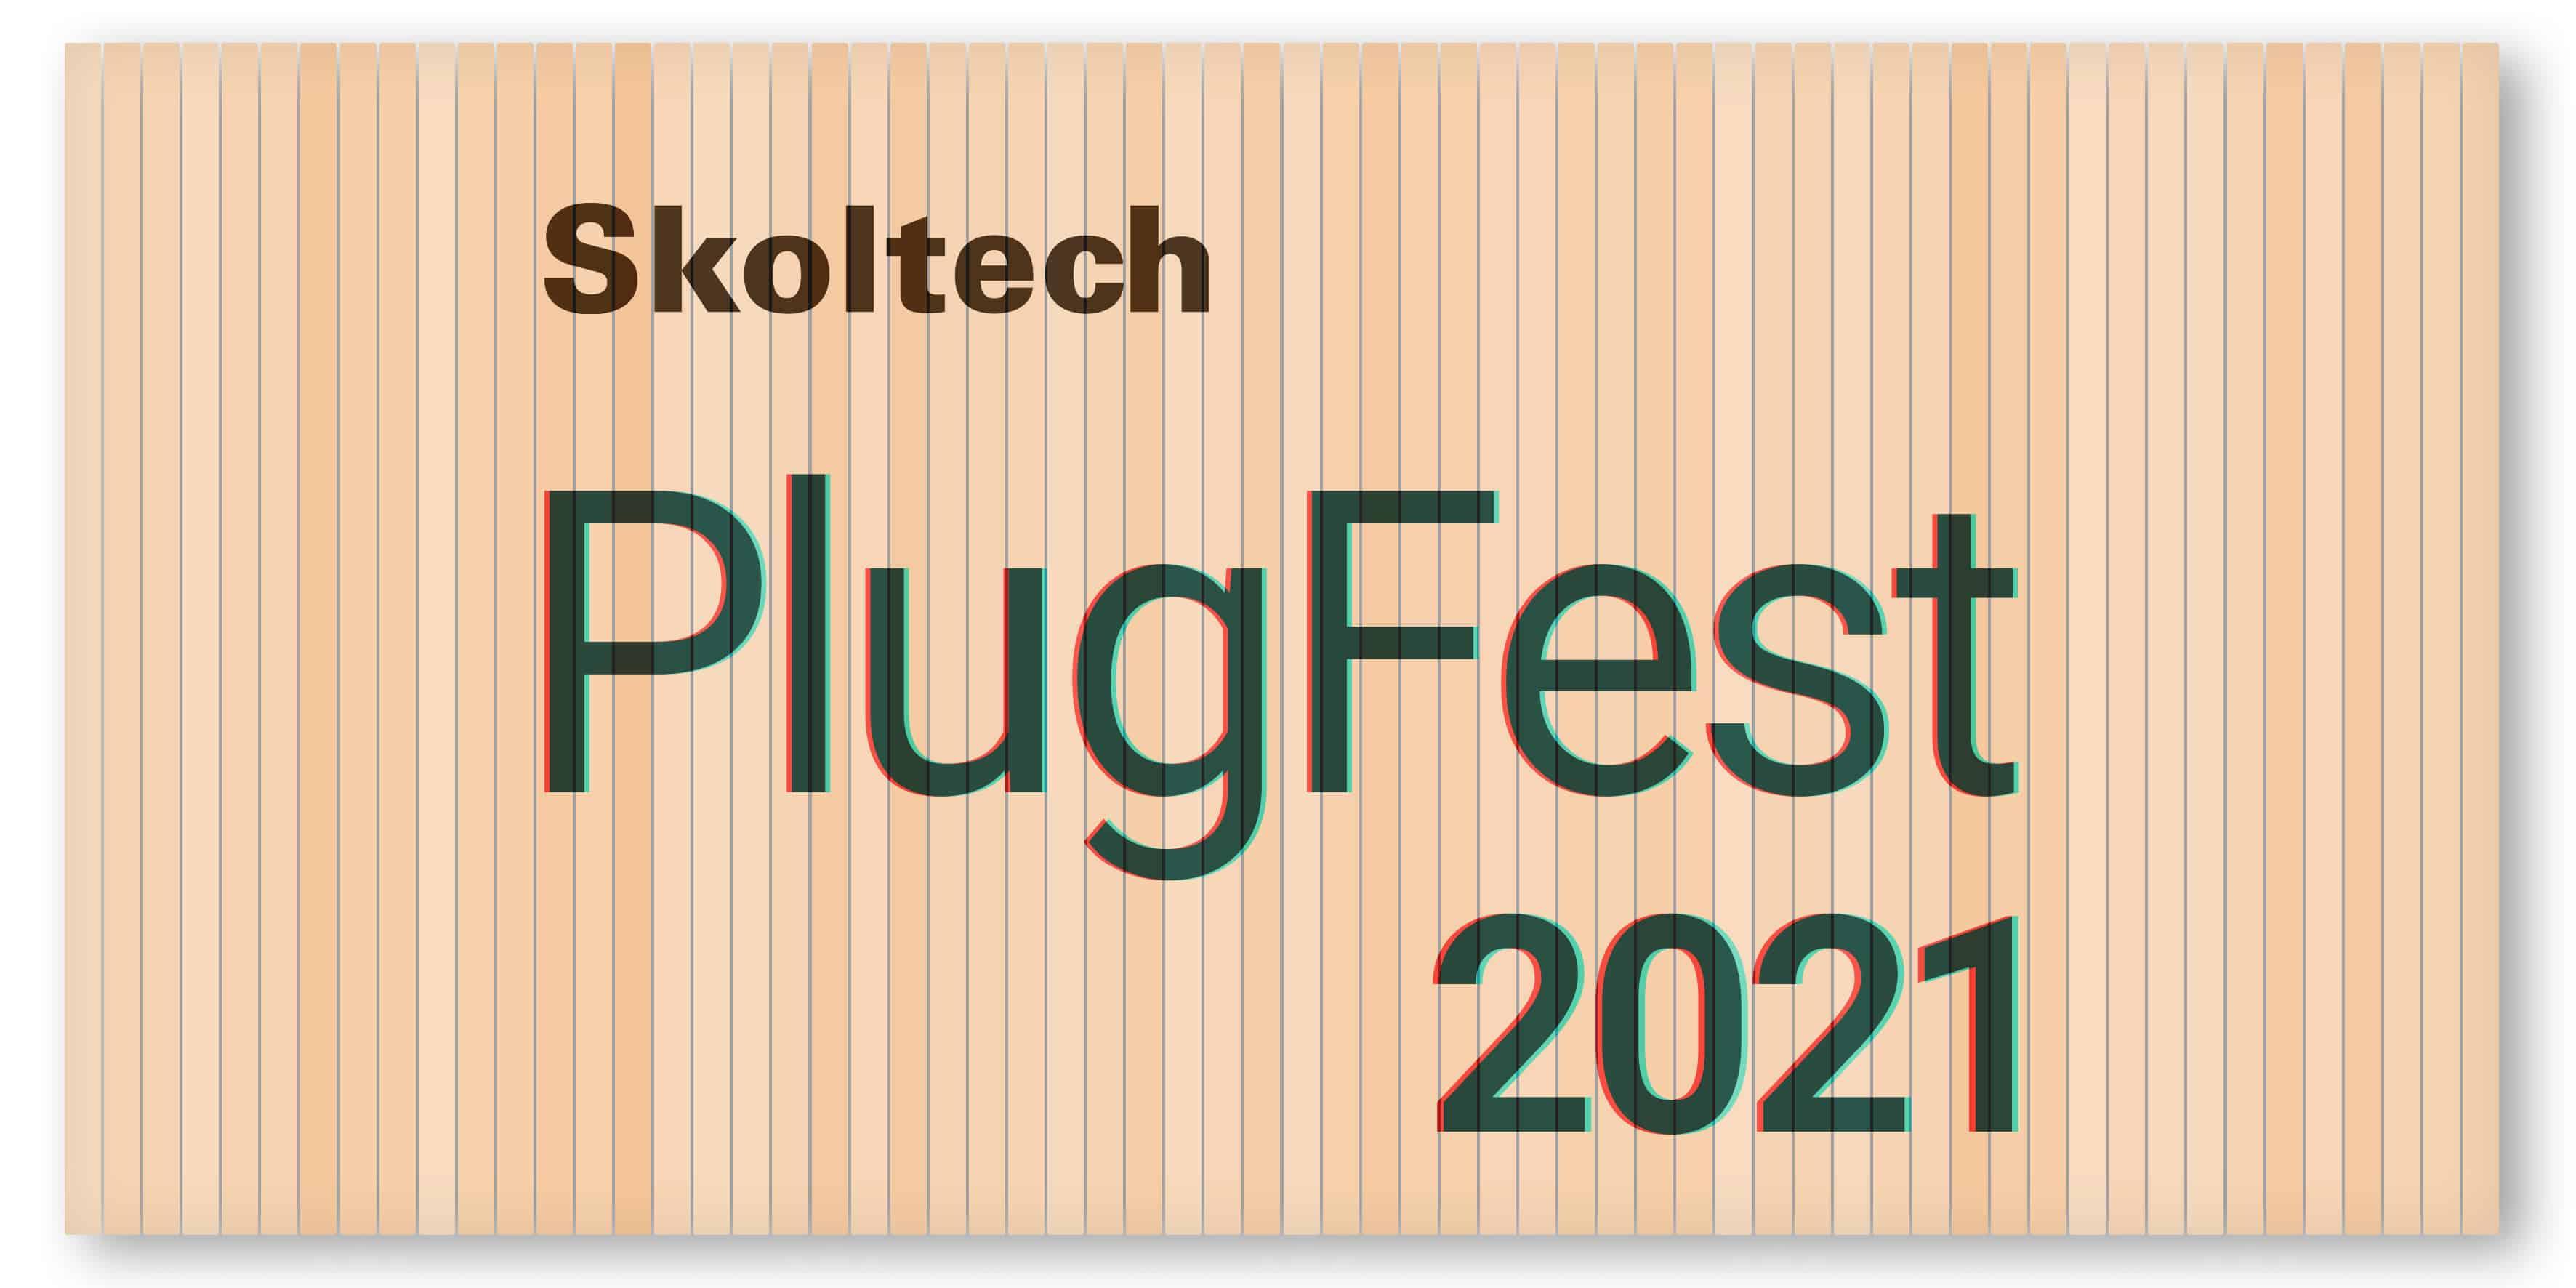 Skoltech's Plugfest 2021